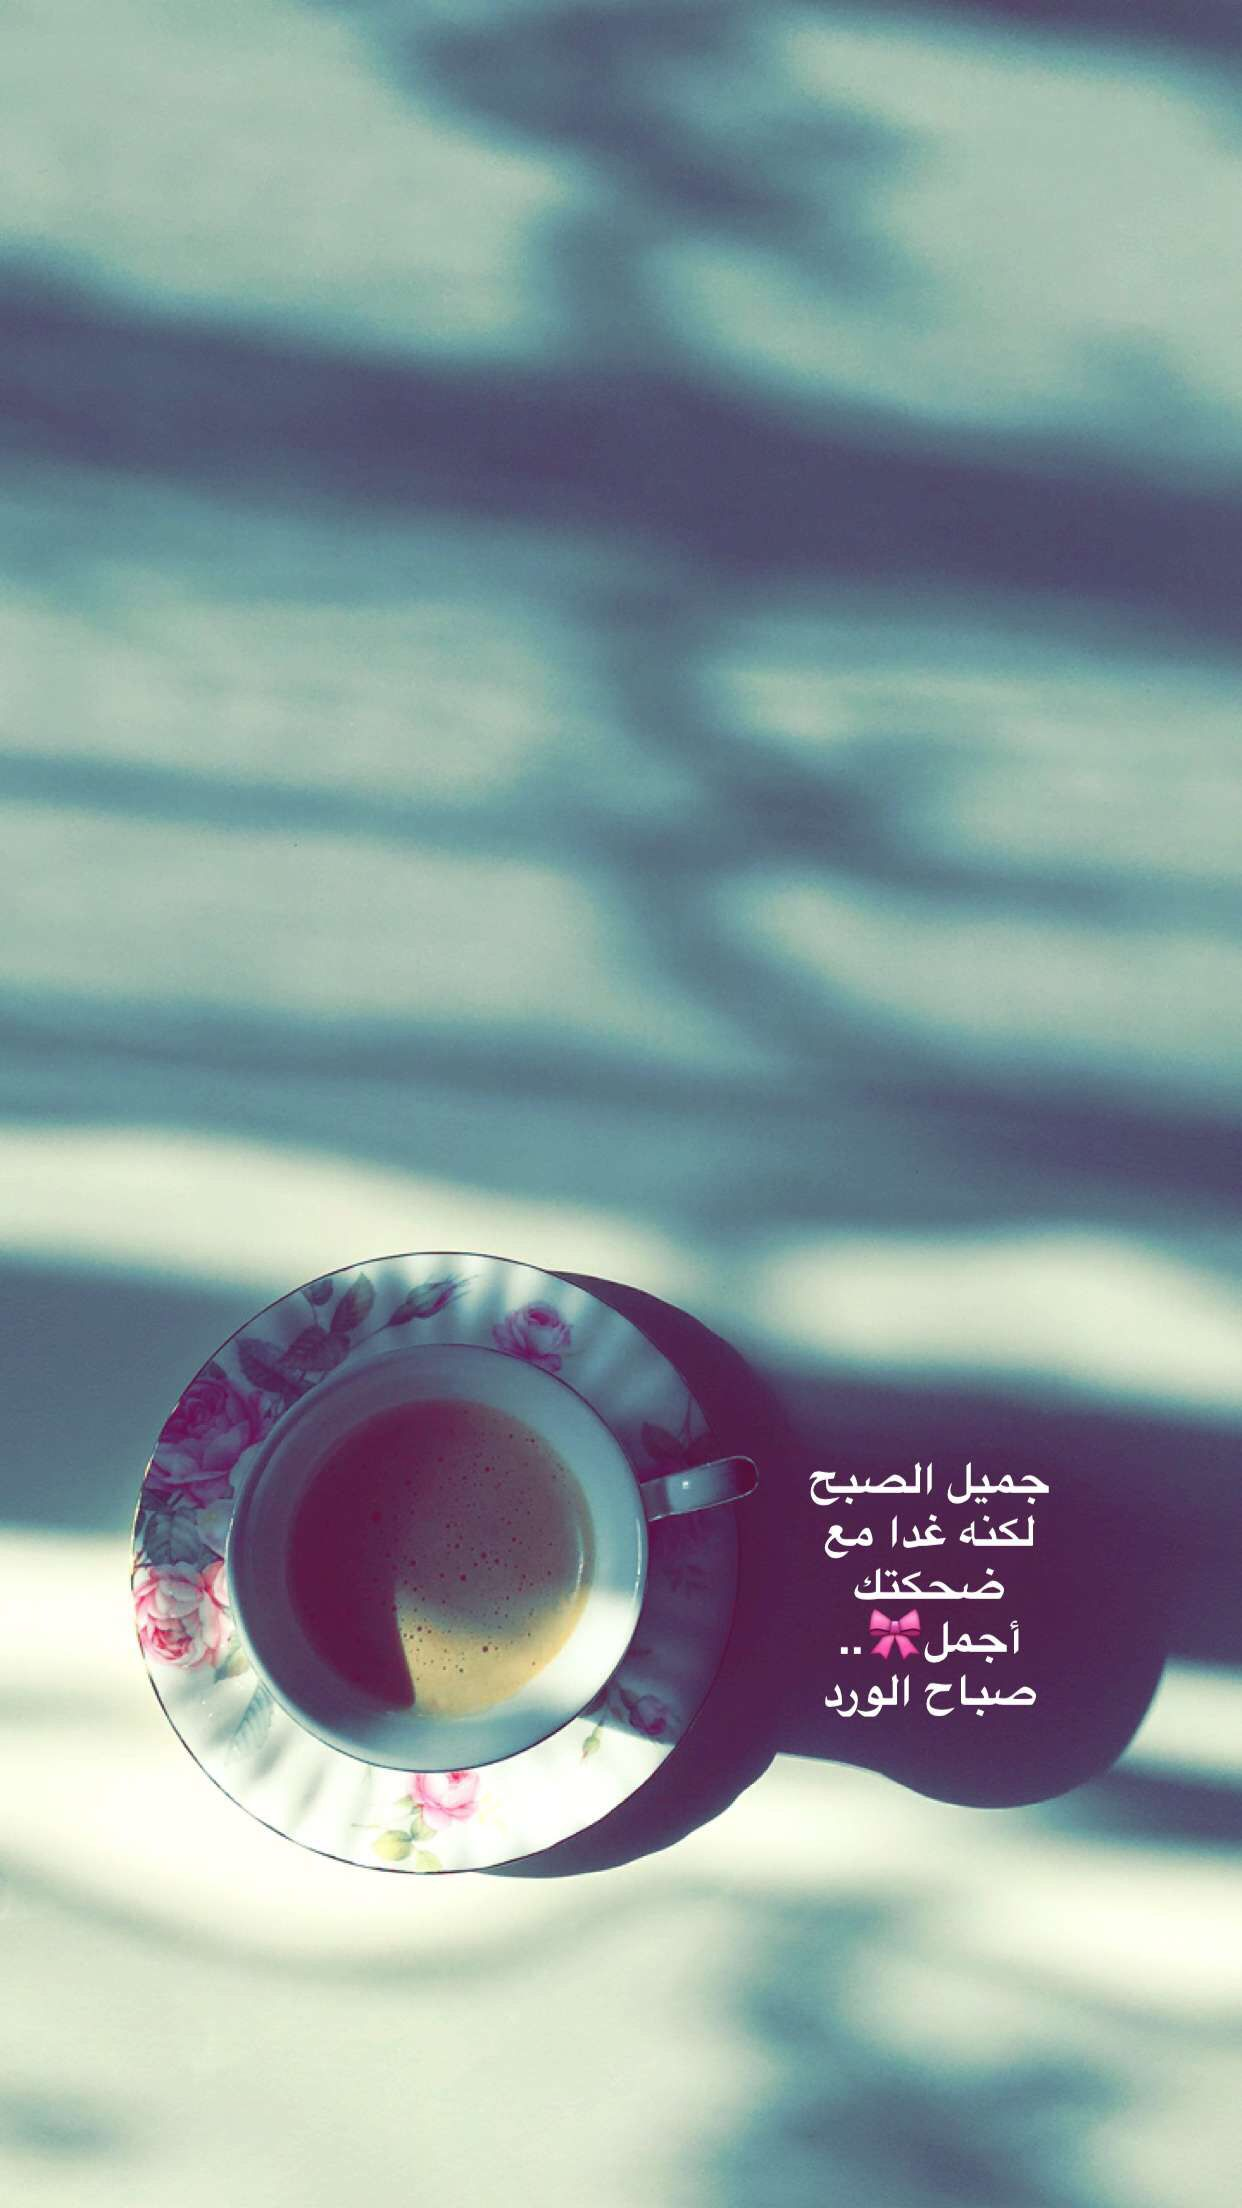 صباح الخير Good Morning Good Night Qoutes Pics